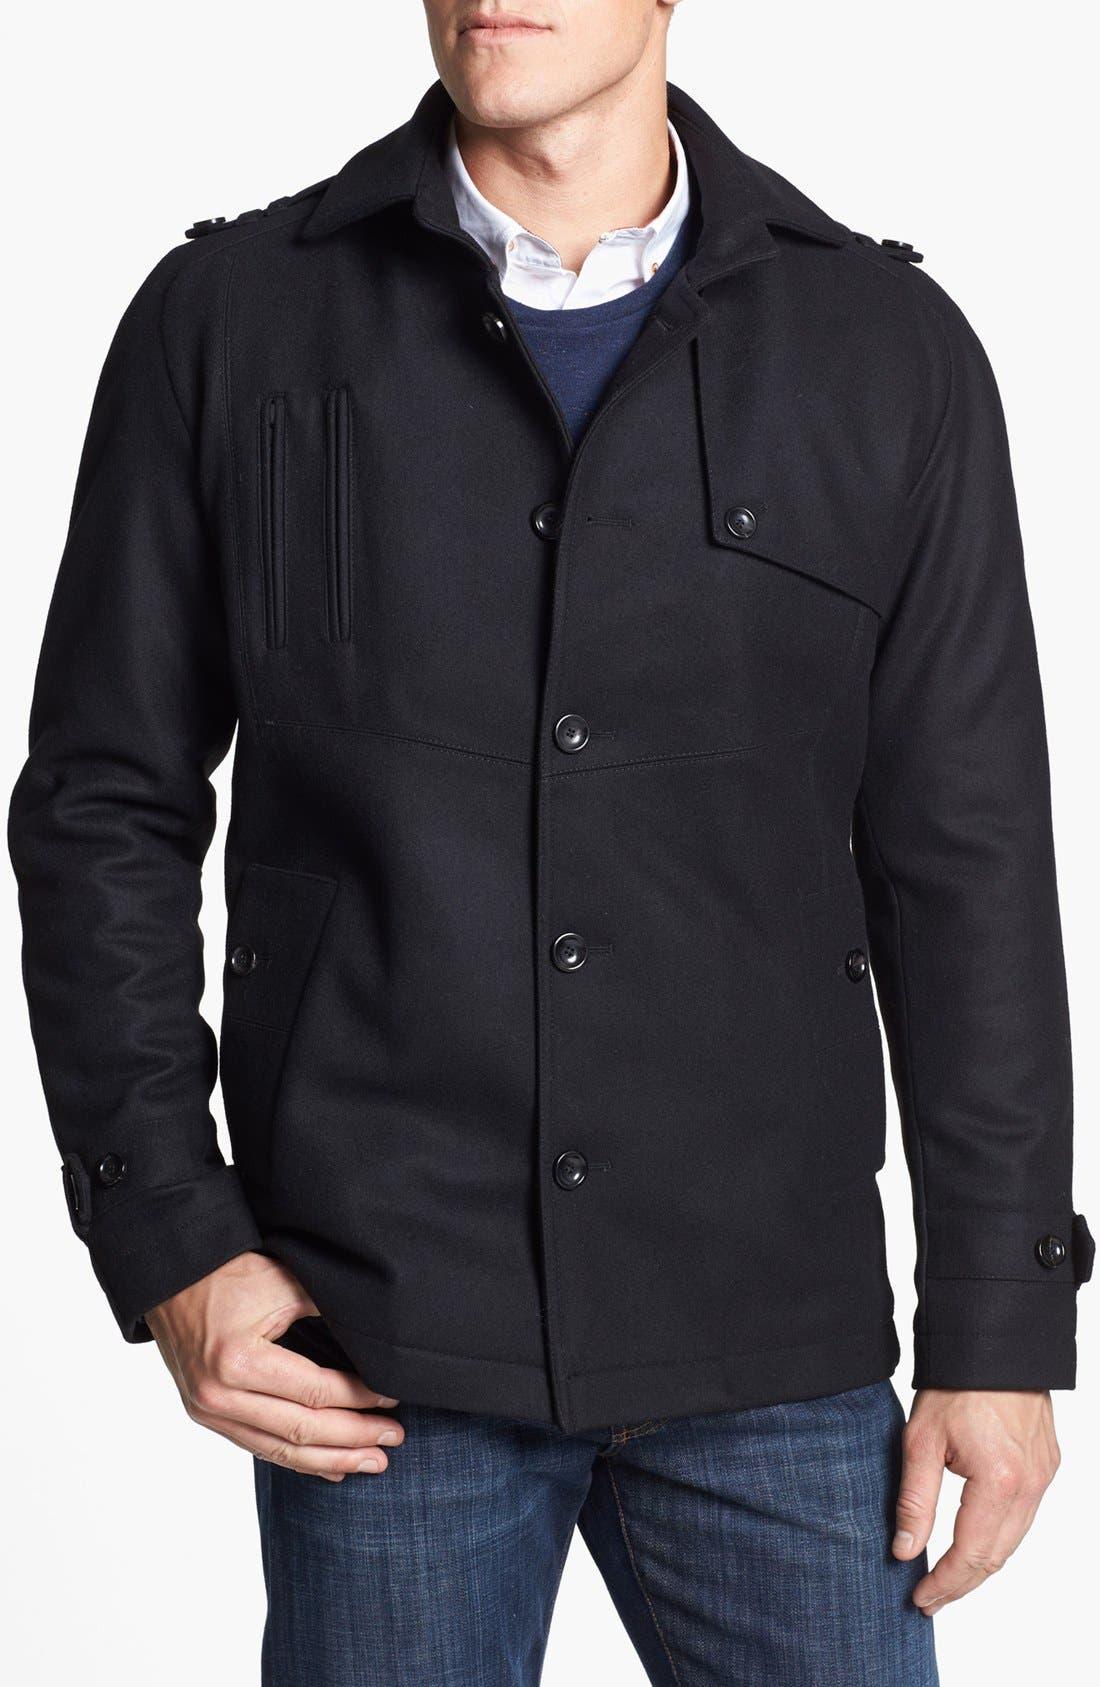 Main Image - JOHNNYLOVE Water Repellent Duffle Jacket